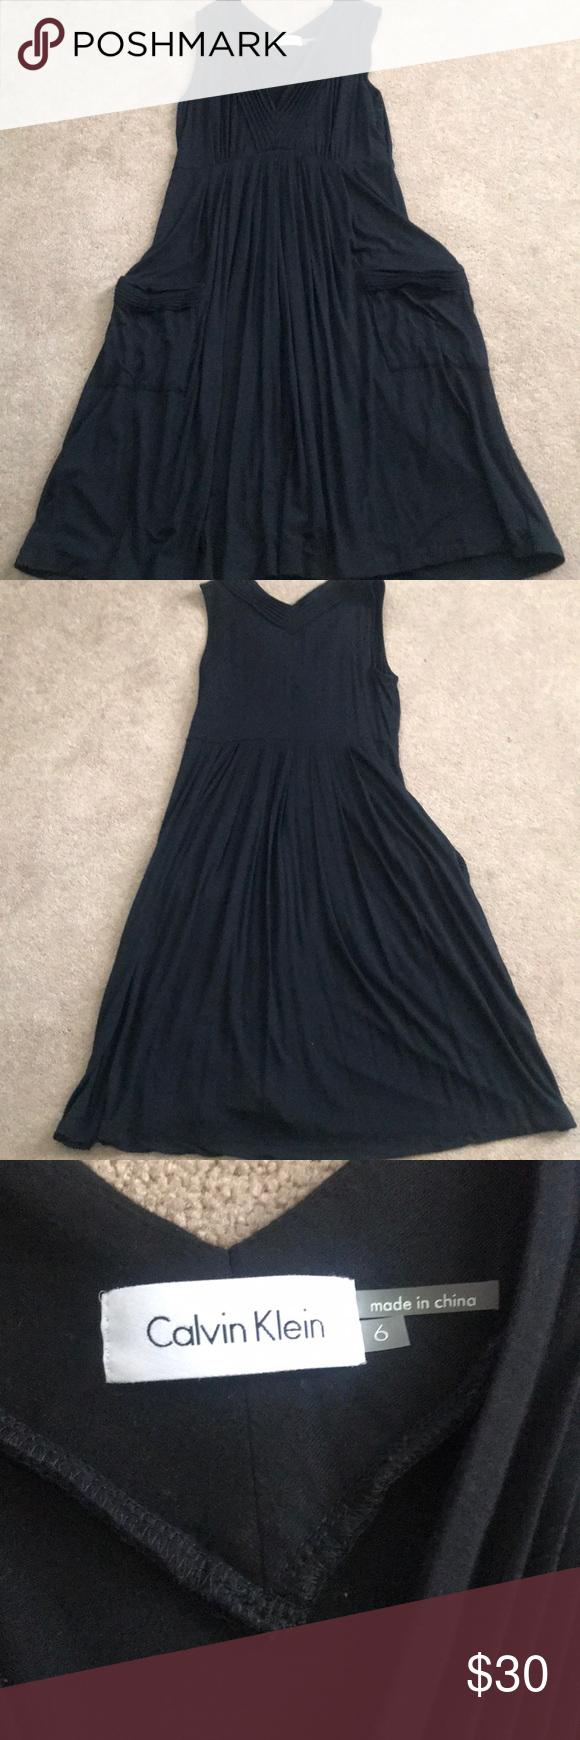 Calvin Klein Summer Dress Black Dress With Pockets Calvin Klein Summer Clothes Design [ 1740 x 580 Pixel ]